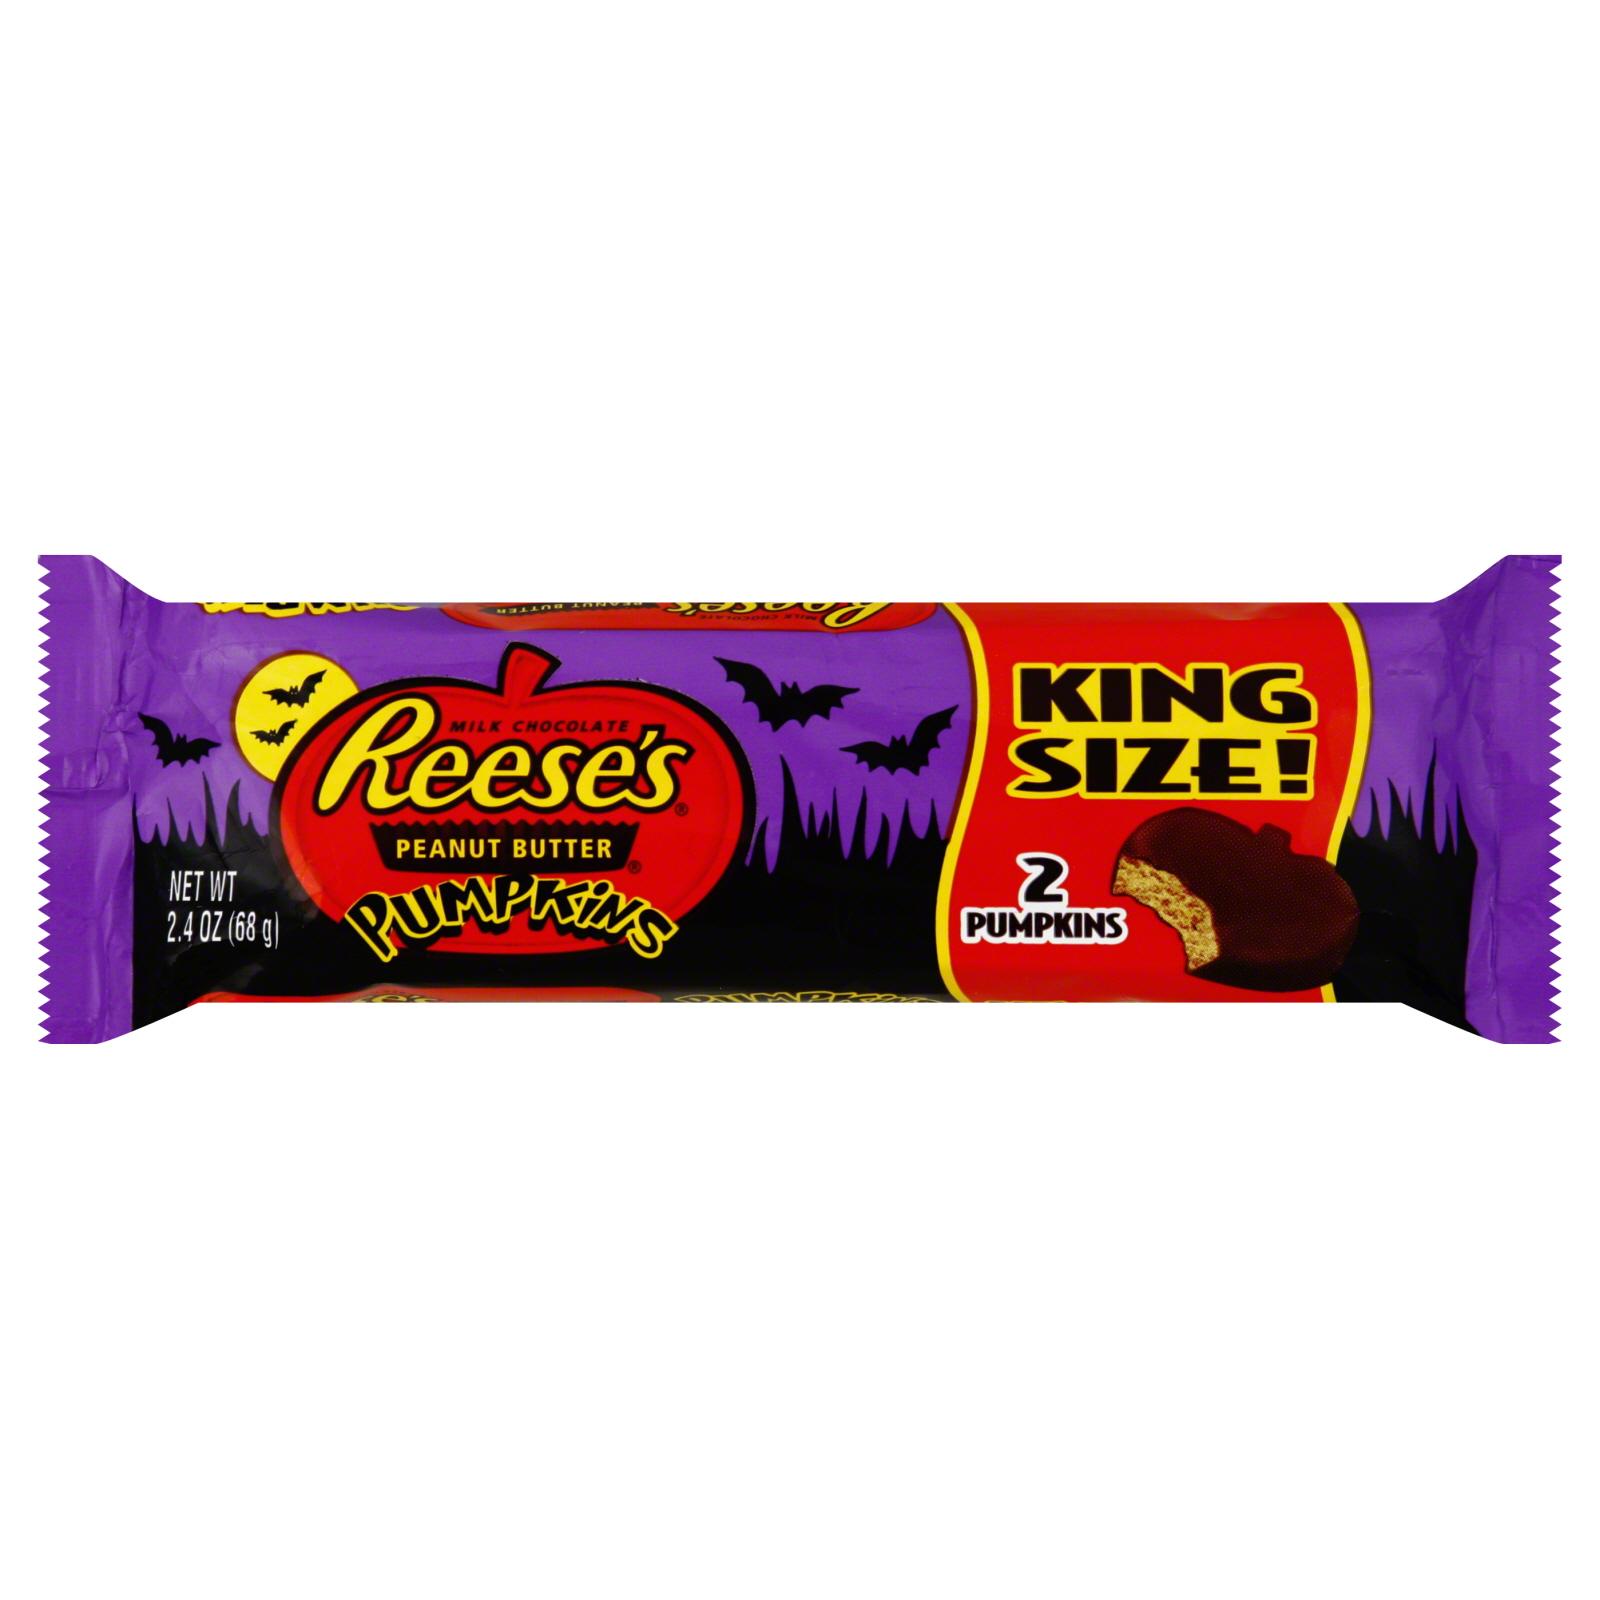 Reese's Peanut Butter Cups, Milk Chocolate, Pumpkins, King Size, 2 pumpkins [2.4 oz (68 g)] PartNumber: 033W003772836000P KsnValue: 033W003772836000